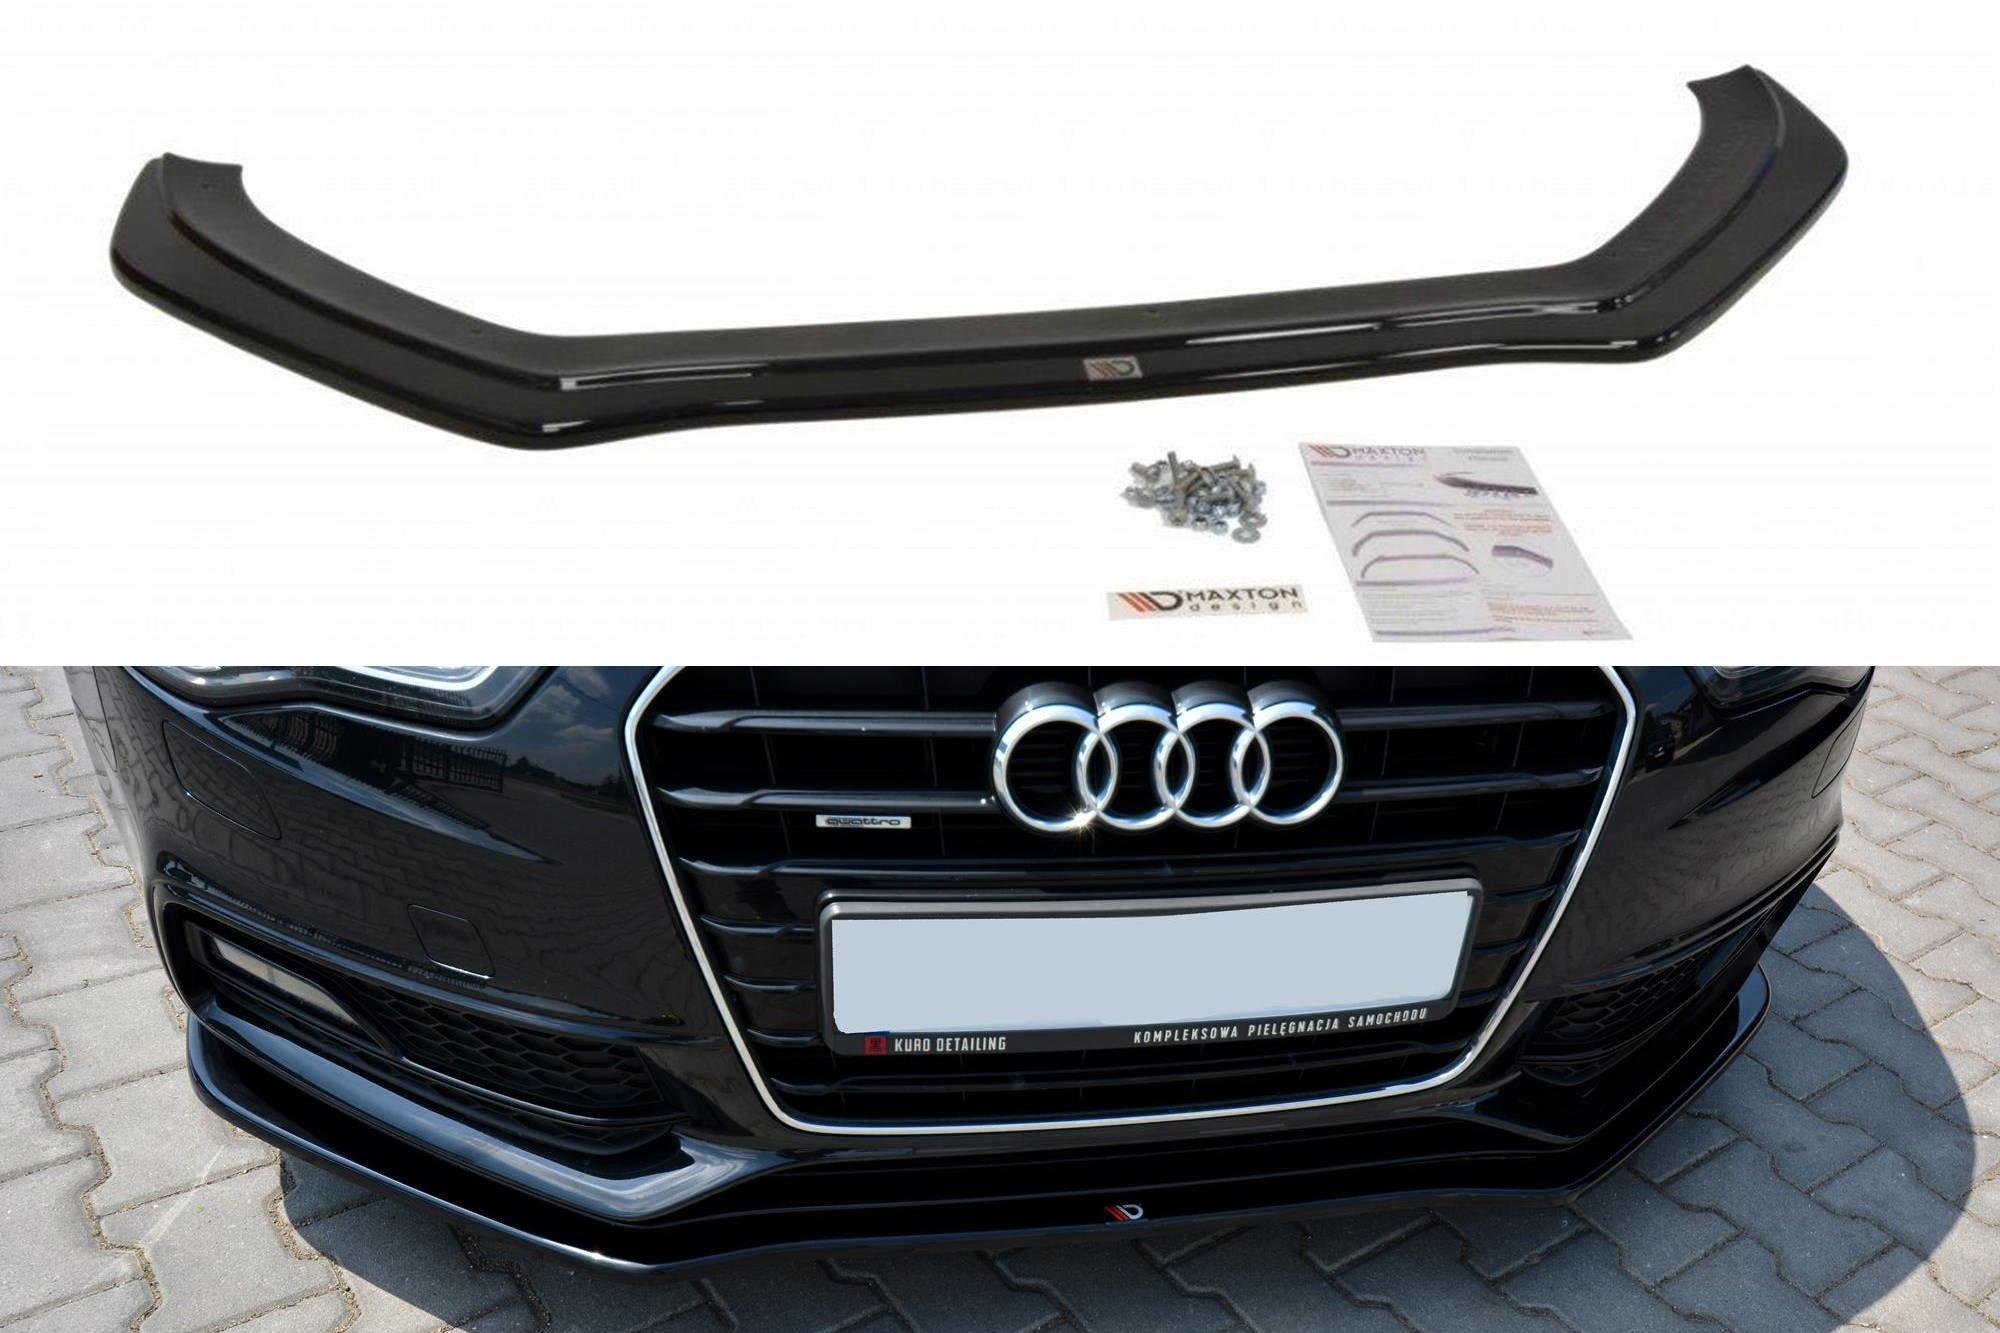 Front Splitter V 2 Audi S5 A5 S Line 8t Fl Our Offer Audi A5 S5 Rs5 A5 S Line 8t Fl 2011 2016 Coupe Our Offer